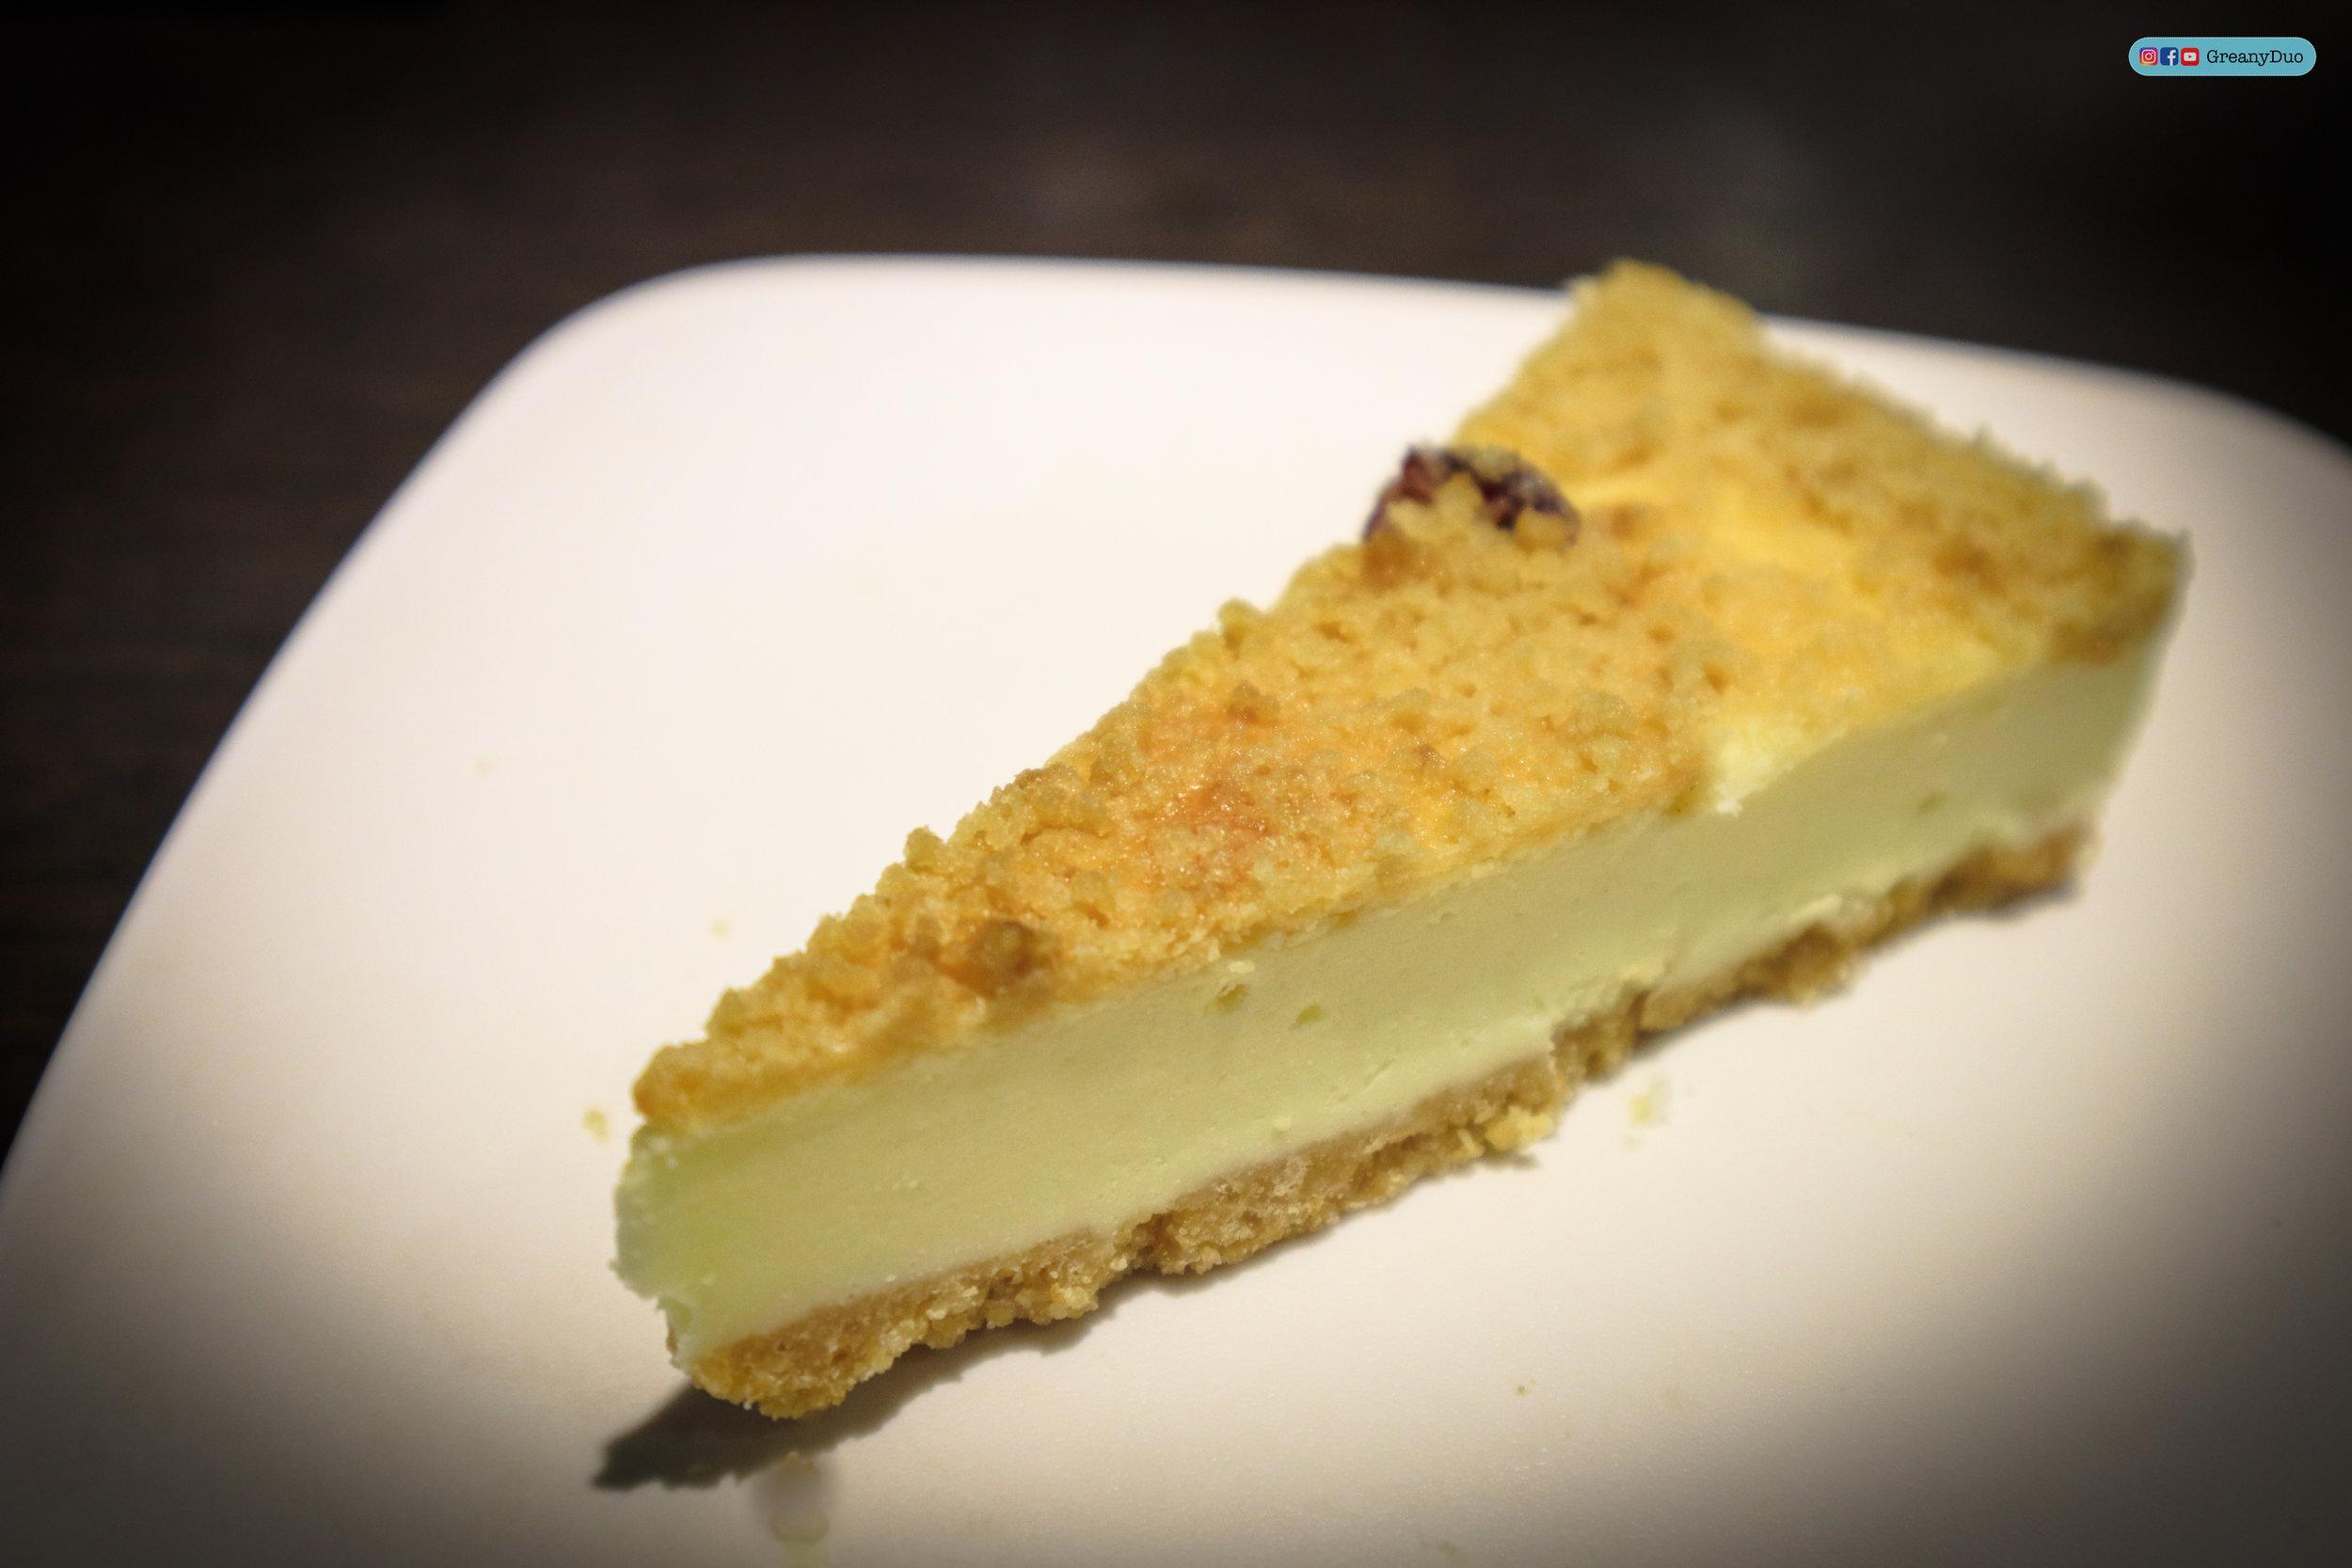 crumble cheesecake at บุฟเฟ่ต์ชาบูไต้หวันที่ Hakkai Shabu Shabu ซีเหมินติง